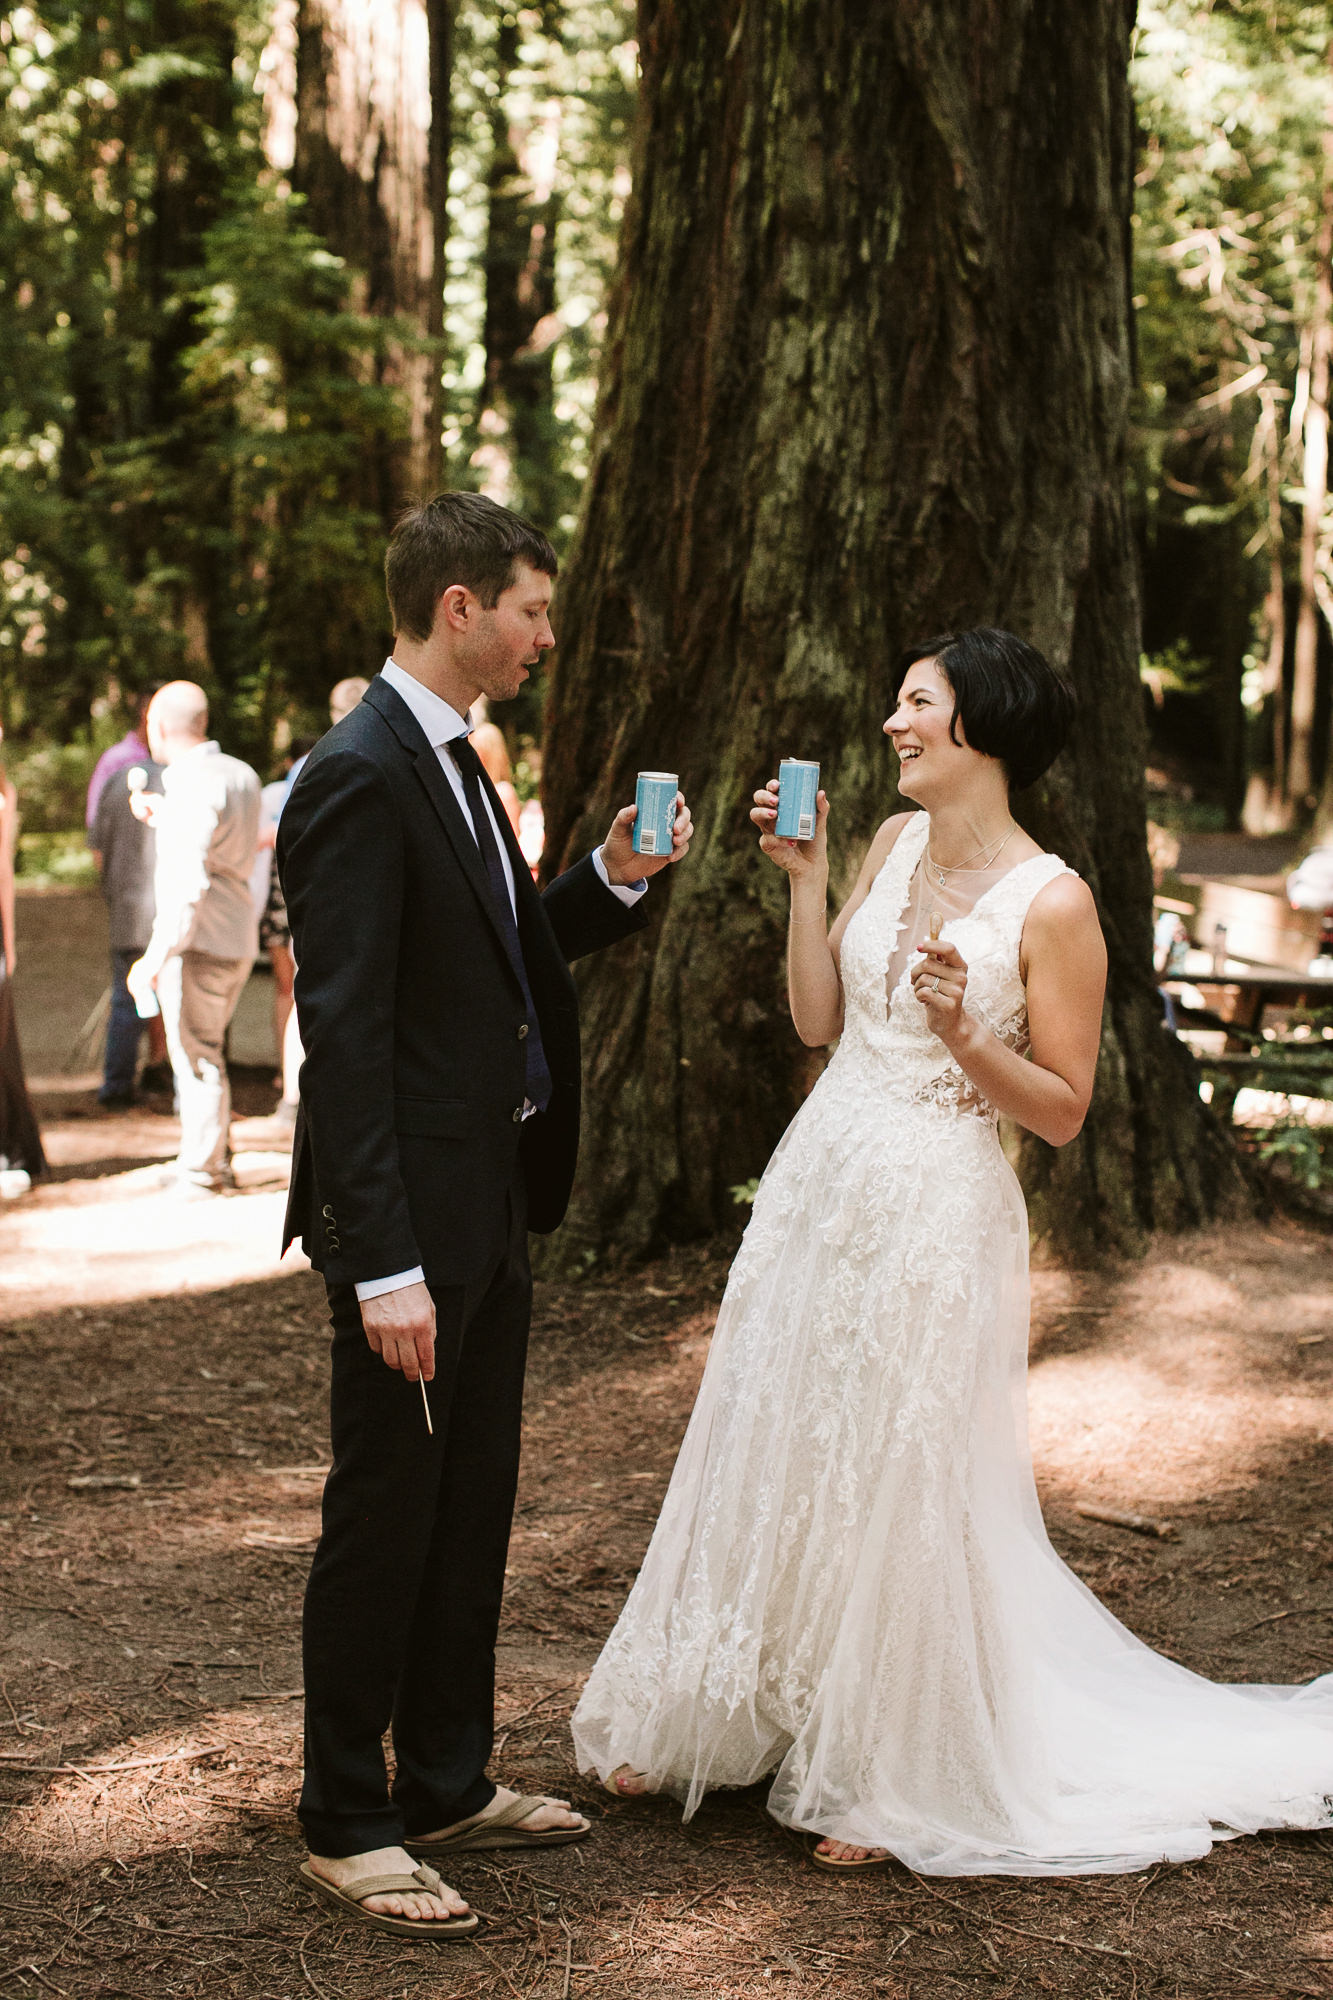 California-wedding-photographer-alfonso-flores-pamplin-groove-231.jpg